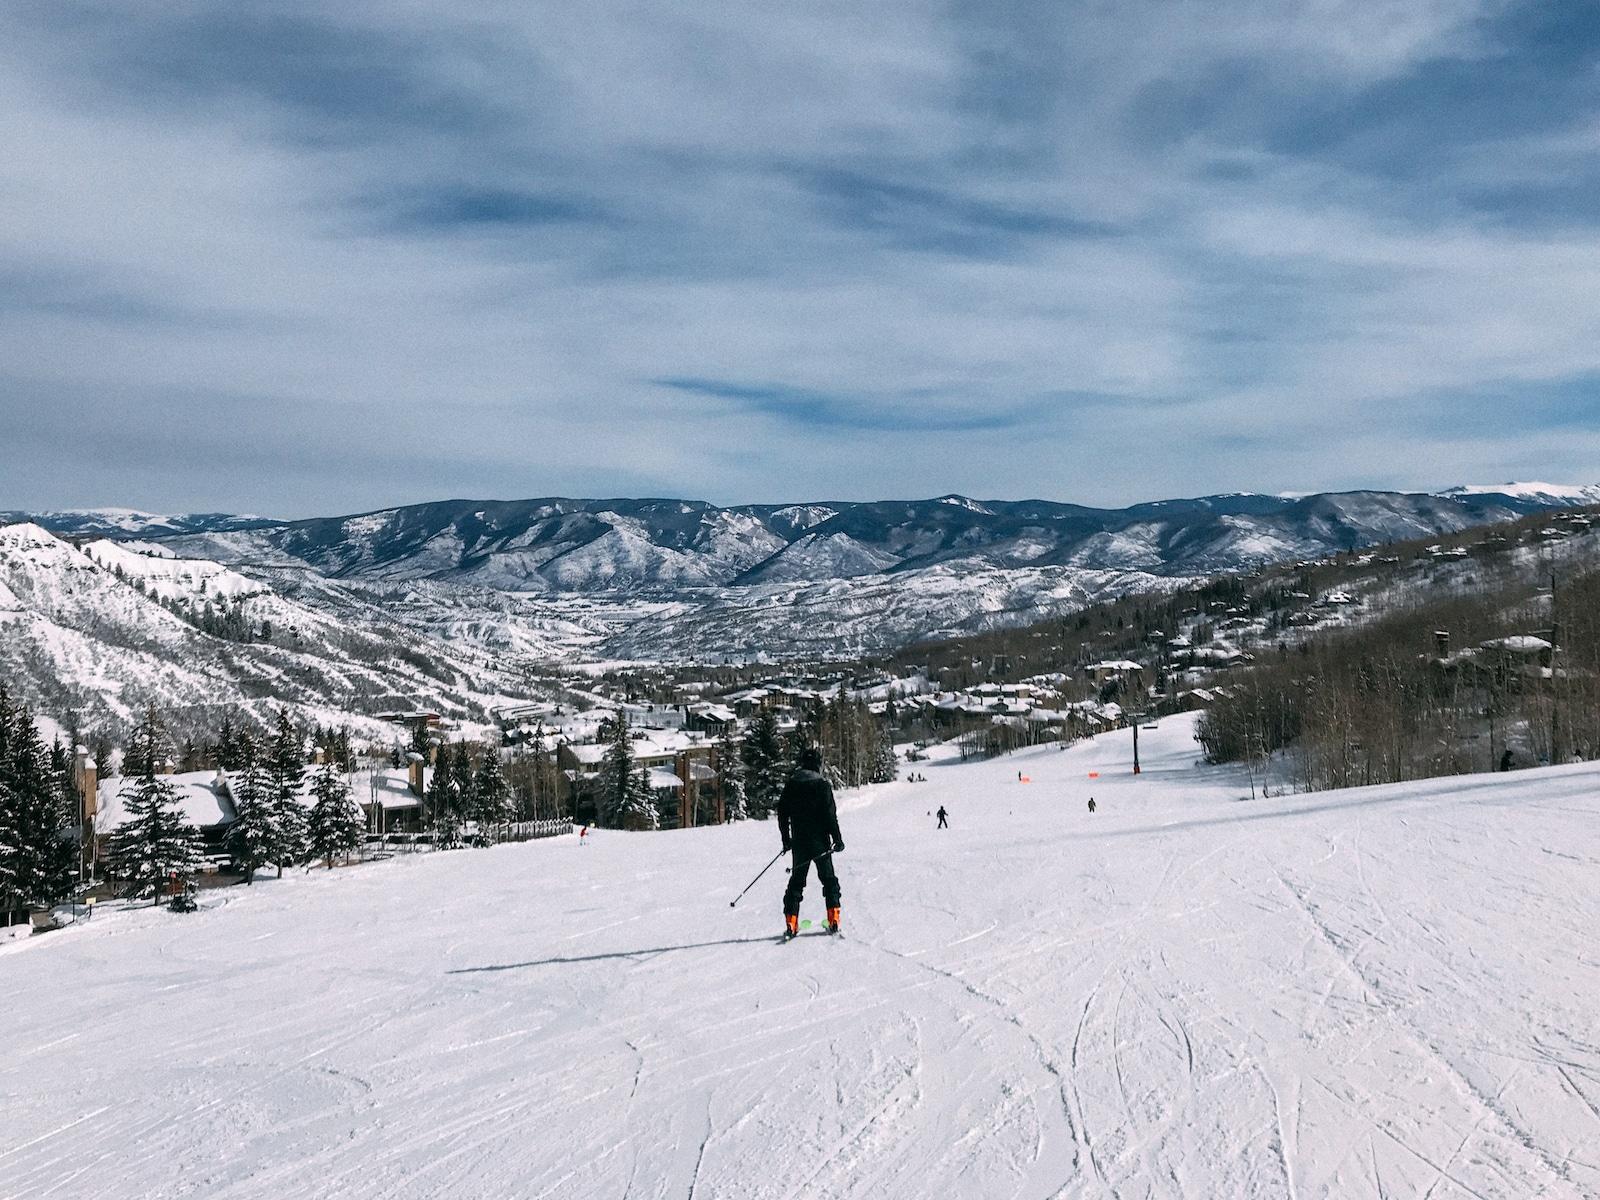 Aspen Snowmass Ski Resort, CO